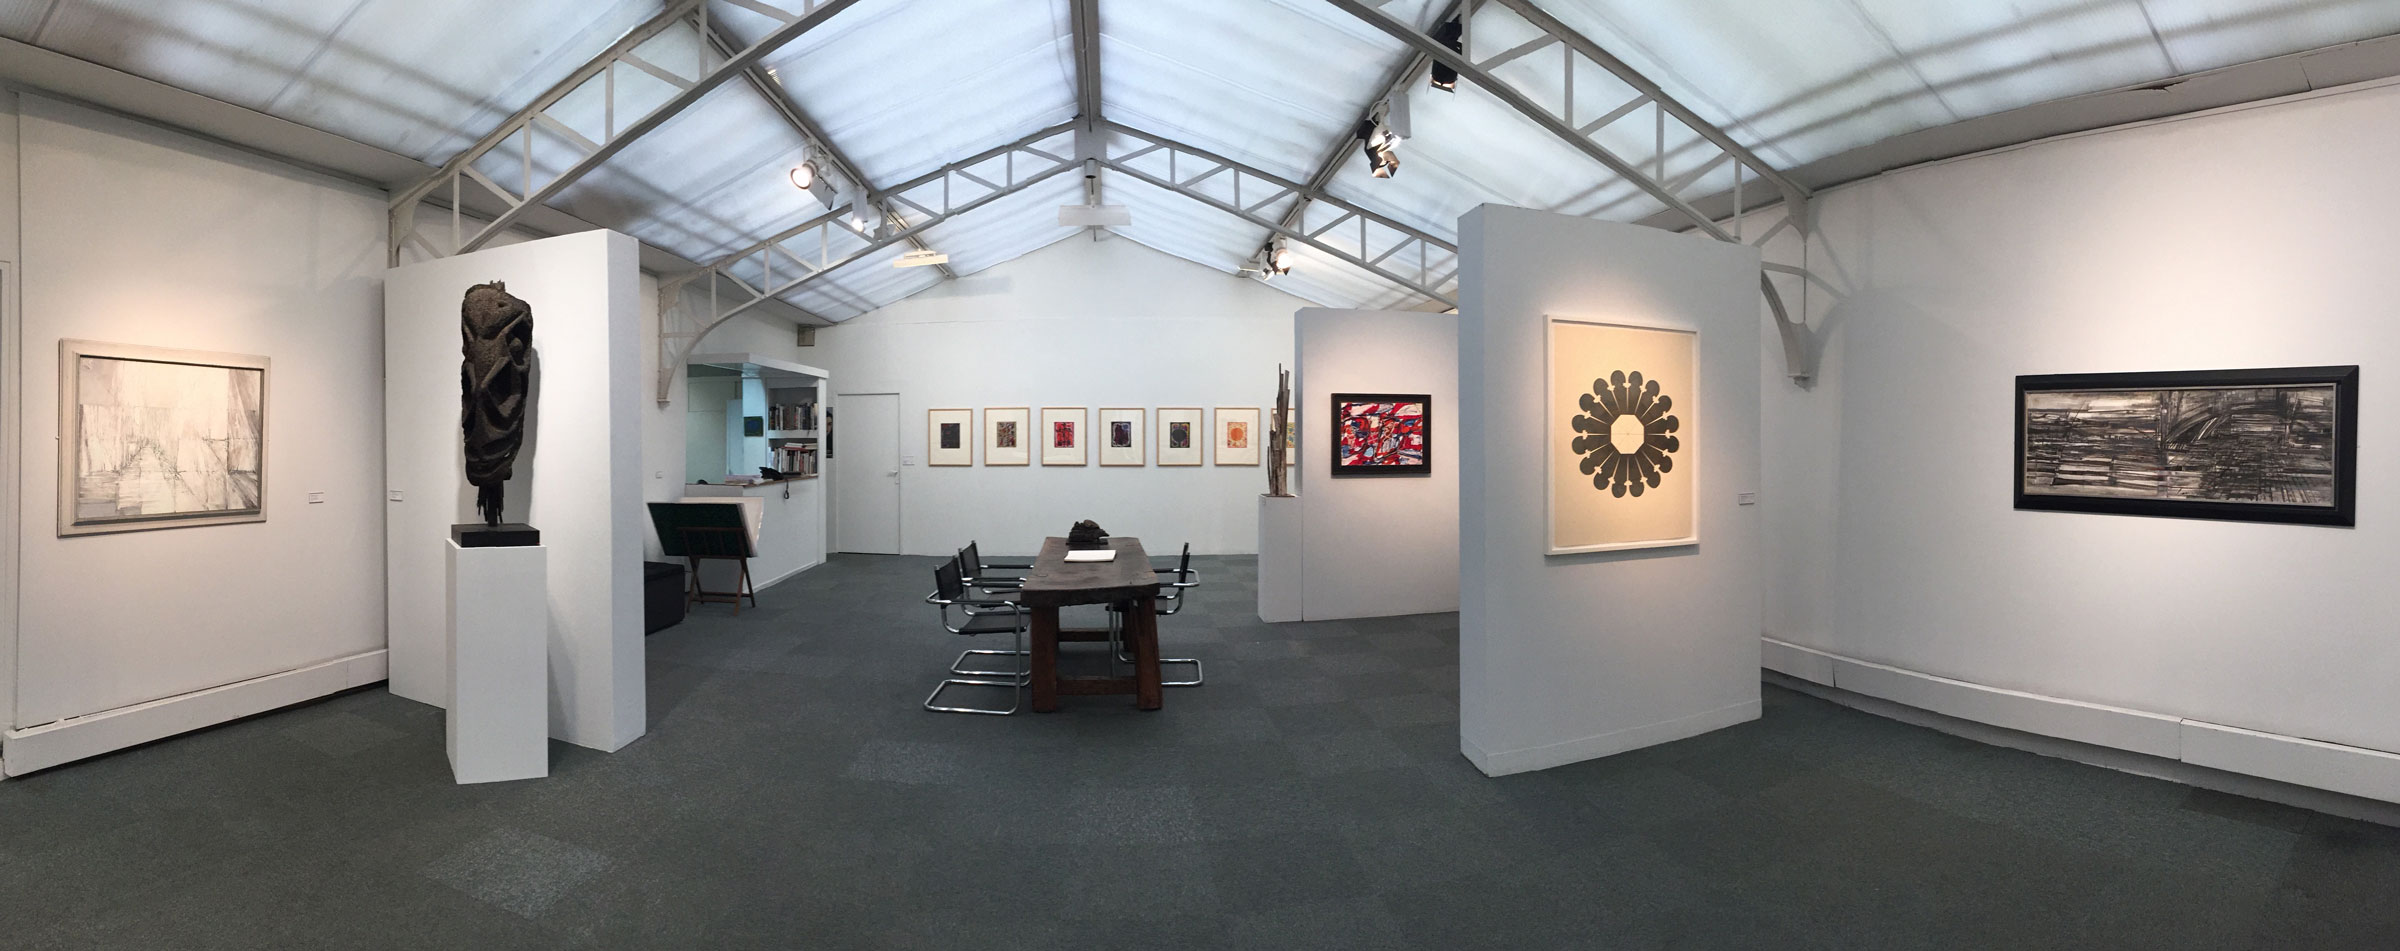 dialogue viii jeanne bucher jaeger galerie d 39 art paris. Black Bedroom Furniture Sets. Home Design Ideas